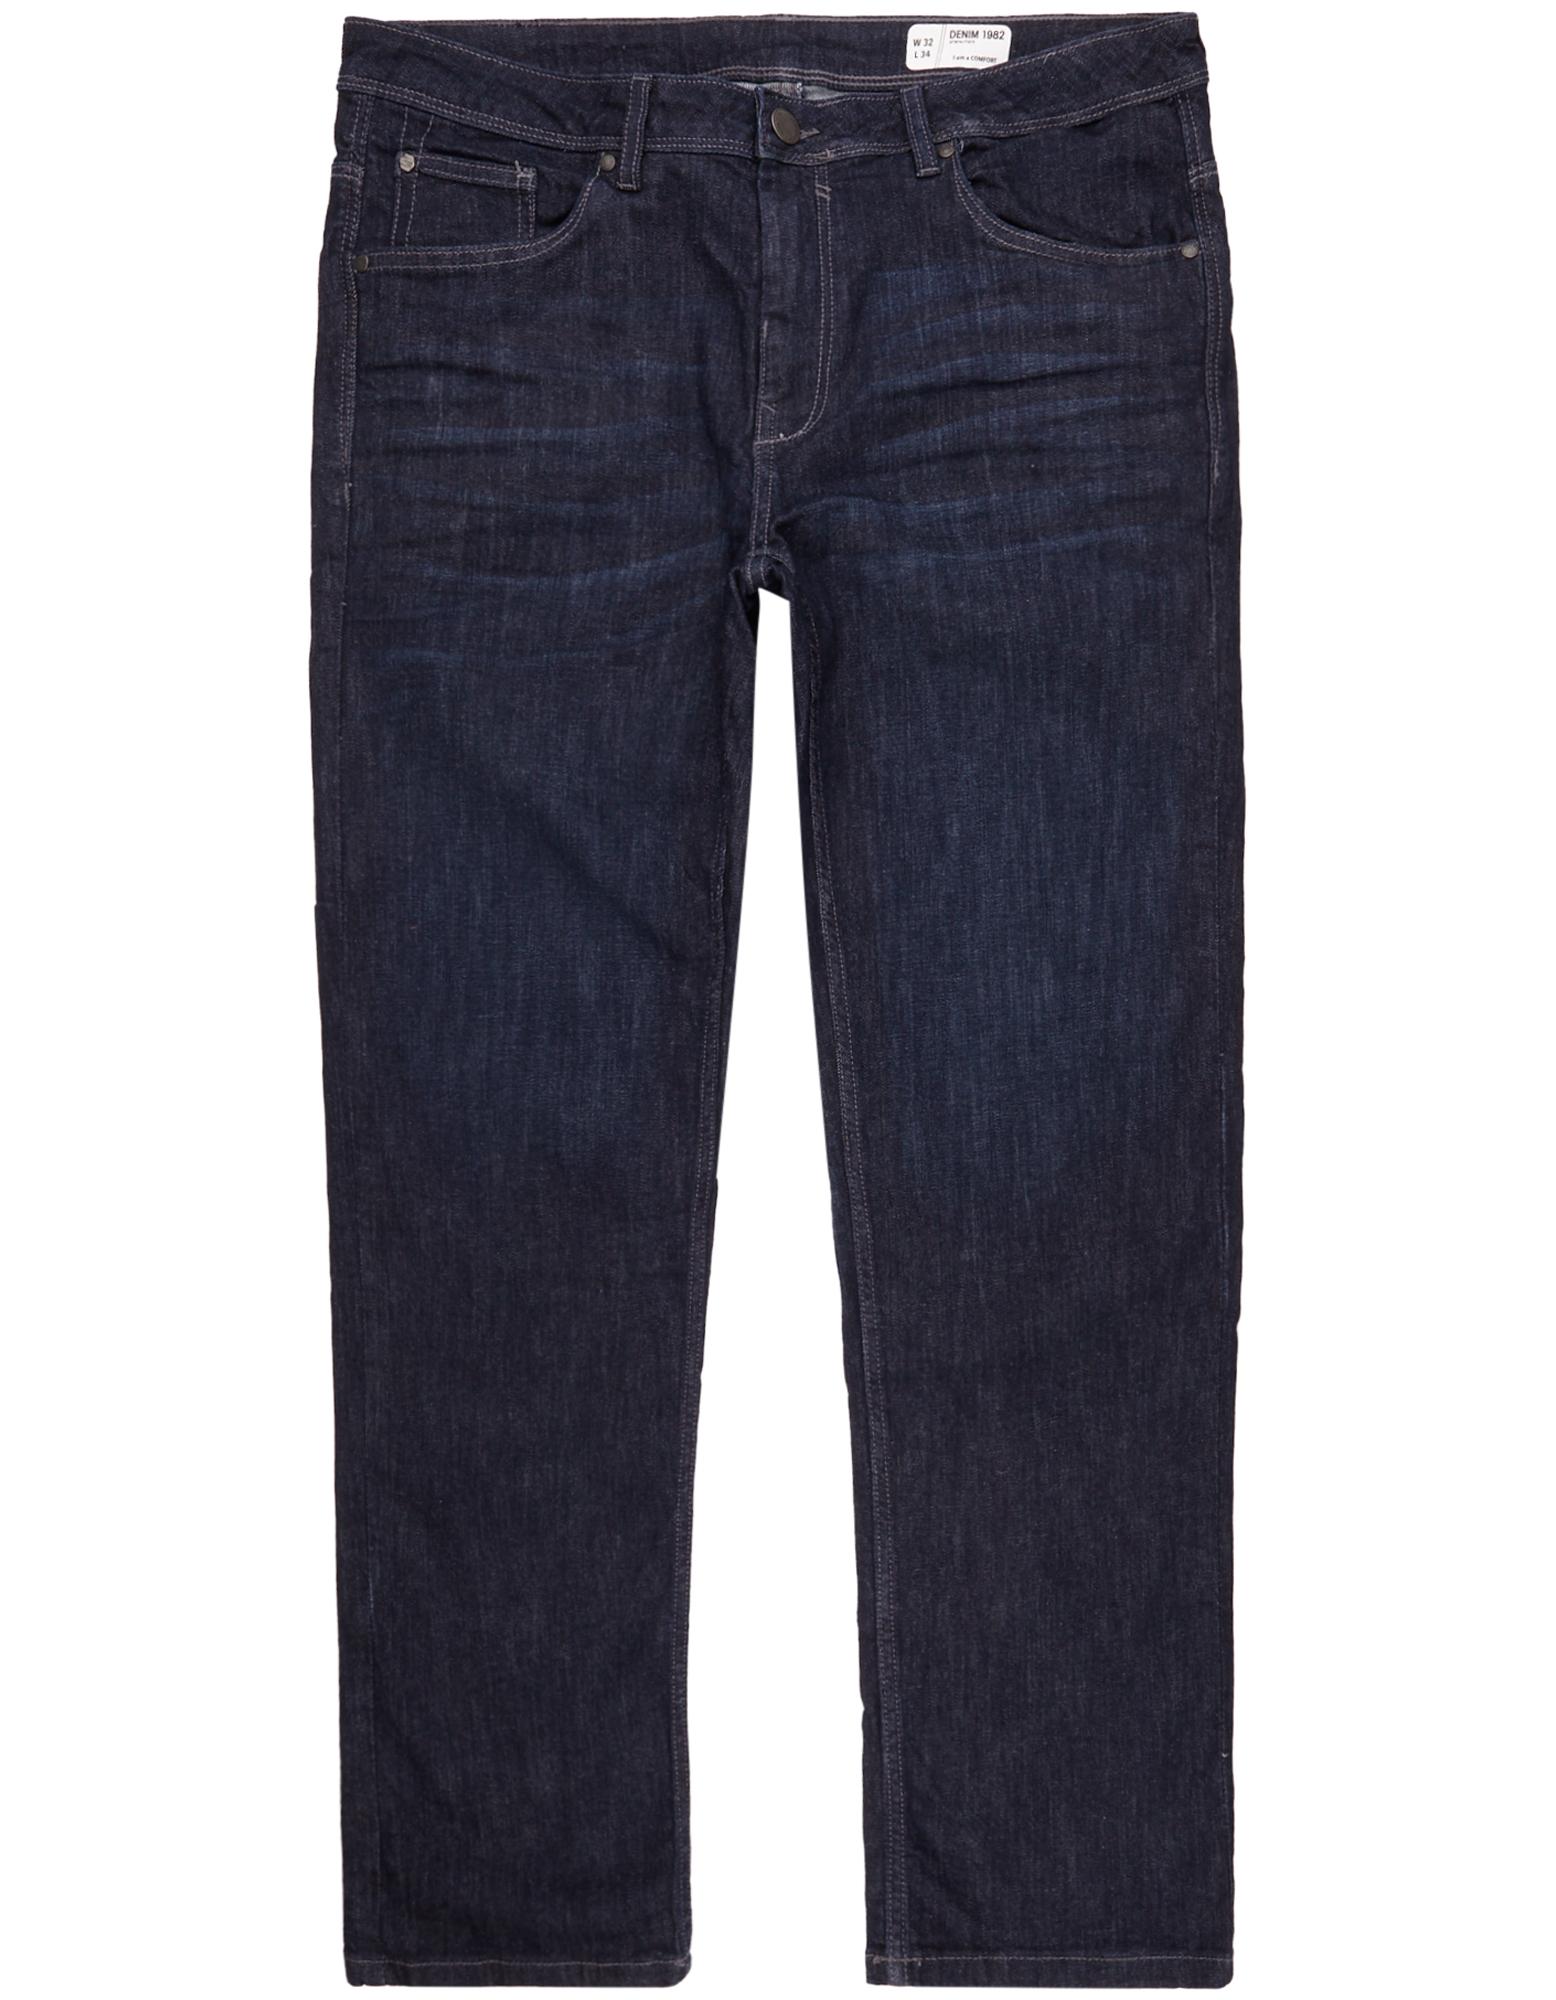 Herren Comfort Fit 5-Pocket-Jeans - Takko Fashion 26d101e757